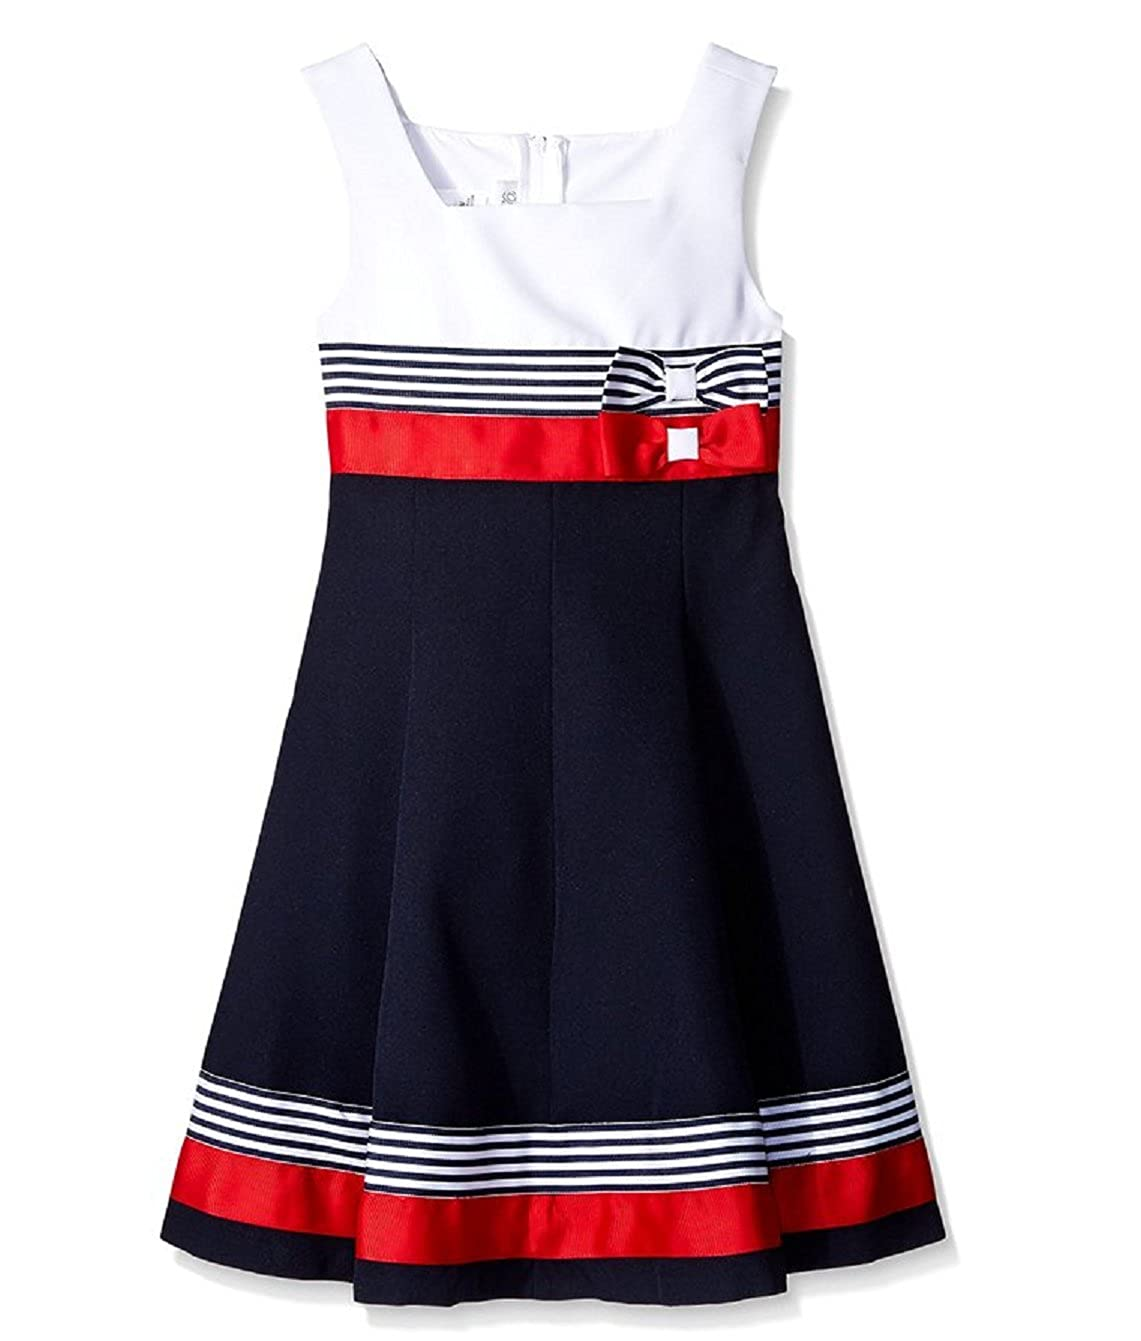 Bonnie Jean Girls Easter Red / Navy Nautical Sailor Uniforms Dress